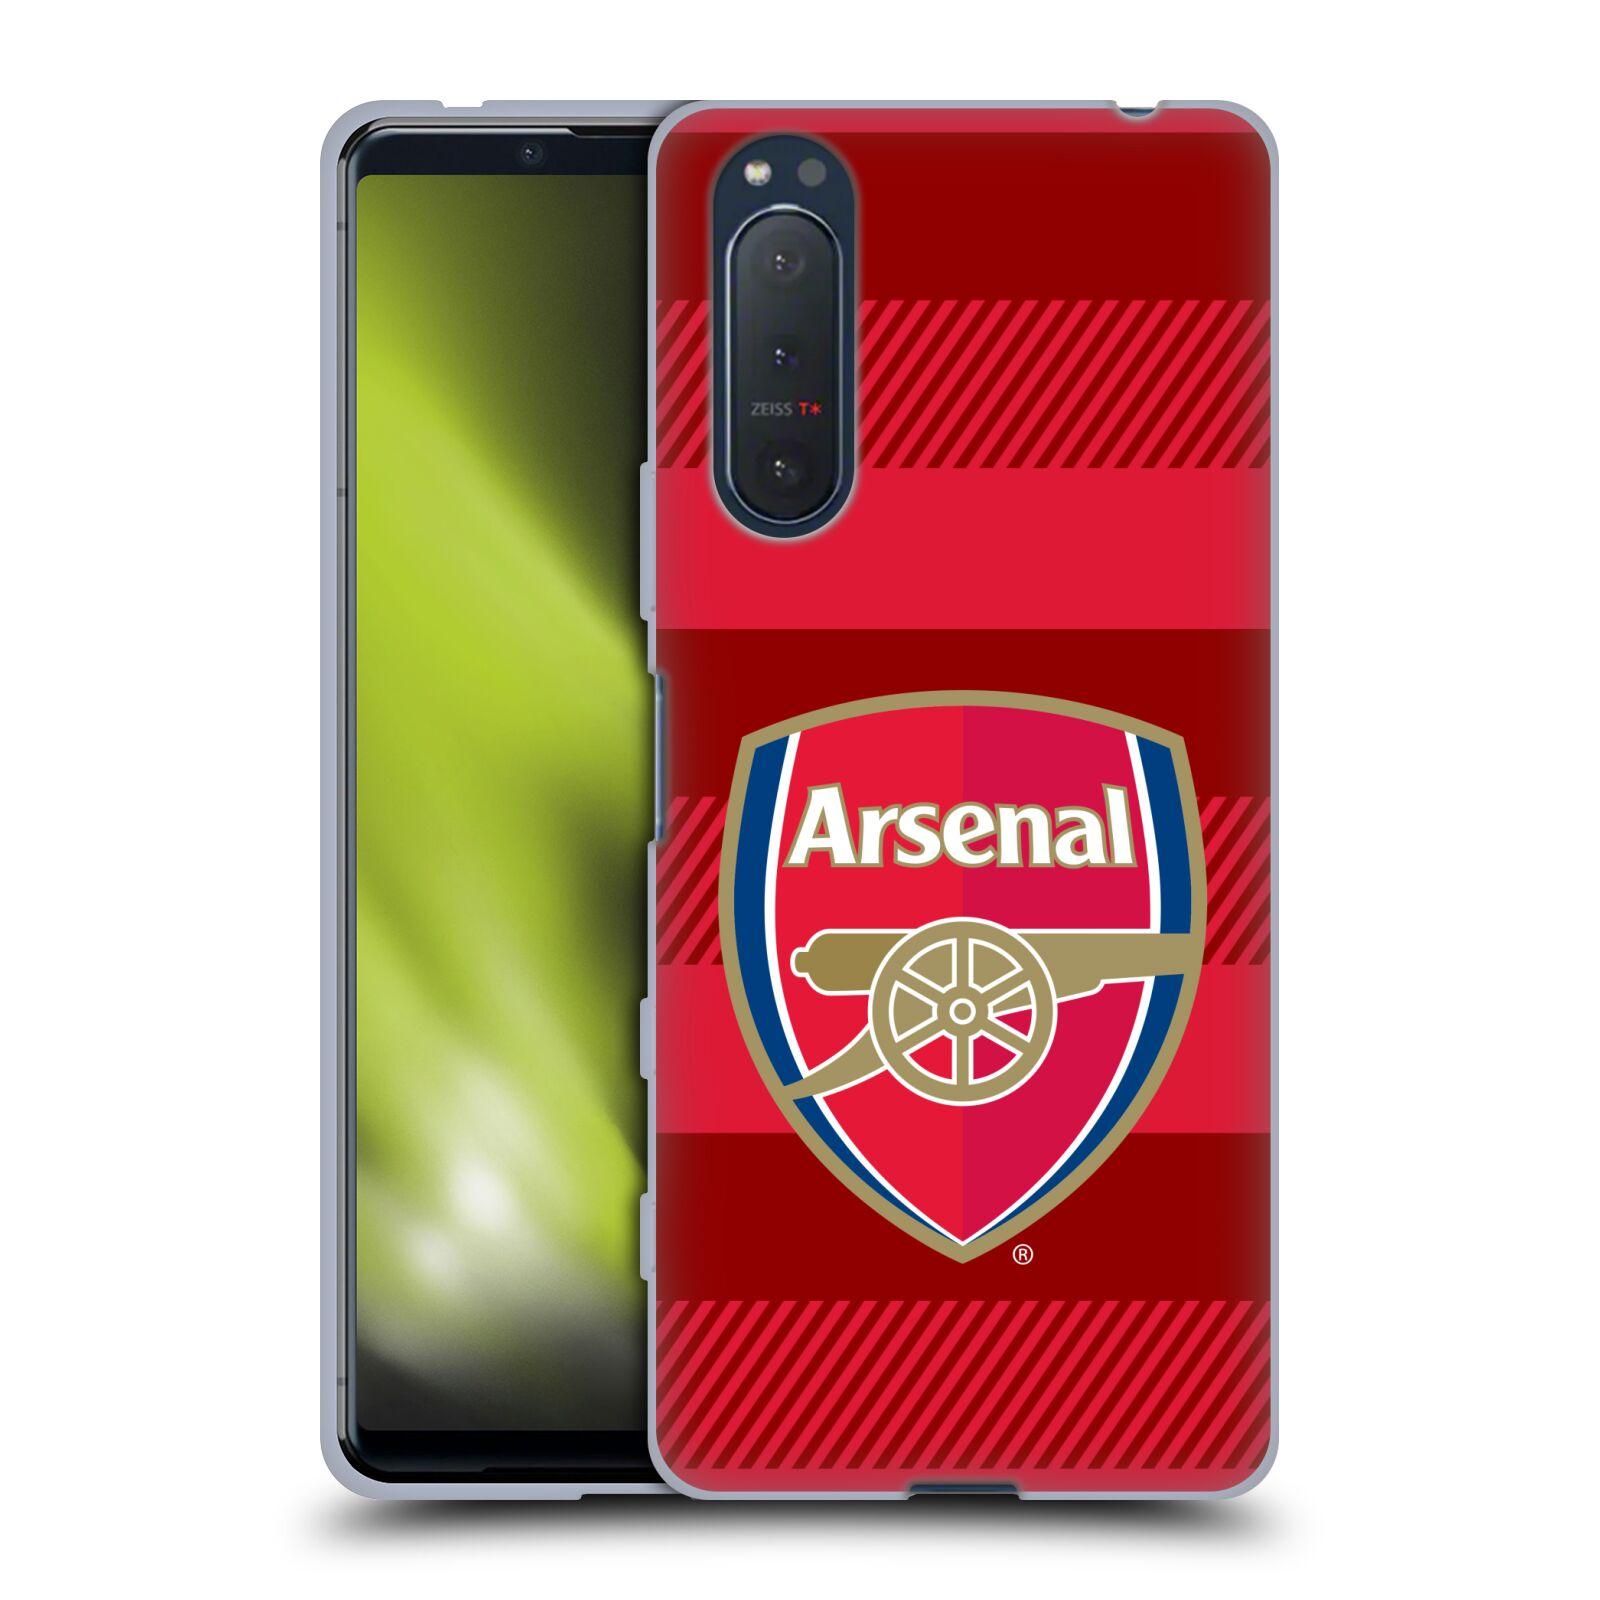 Silikonové pouzdro na mobil Sony Xperia 5 II - Head Case - Arsenal FC - Logo s pruhy